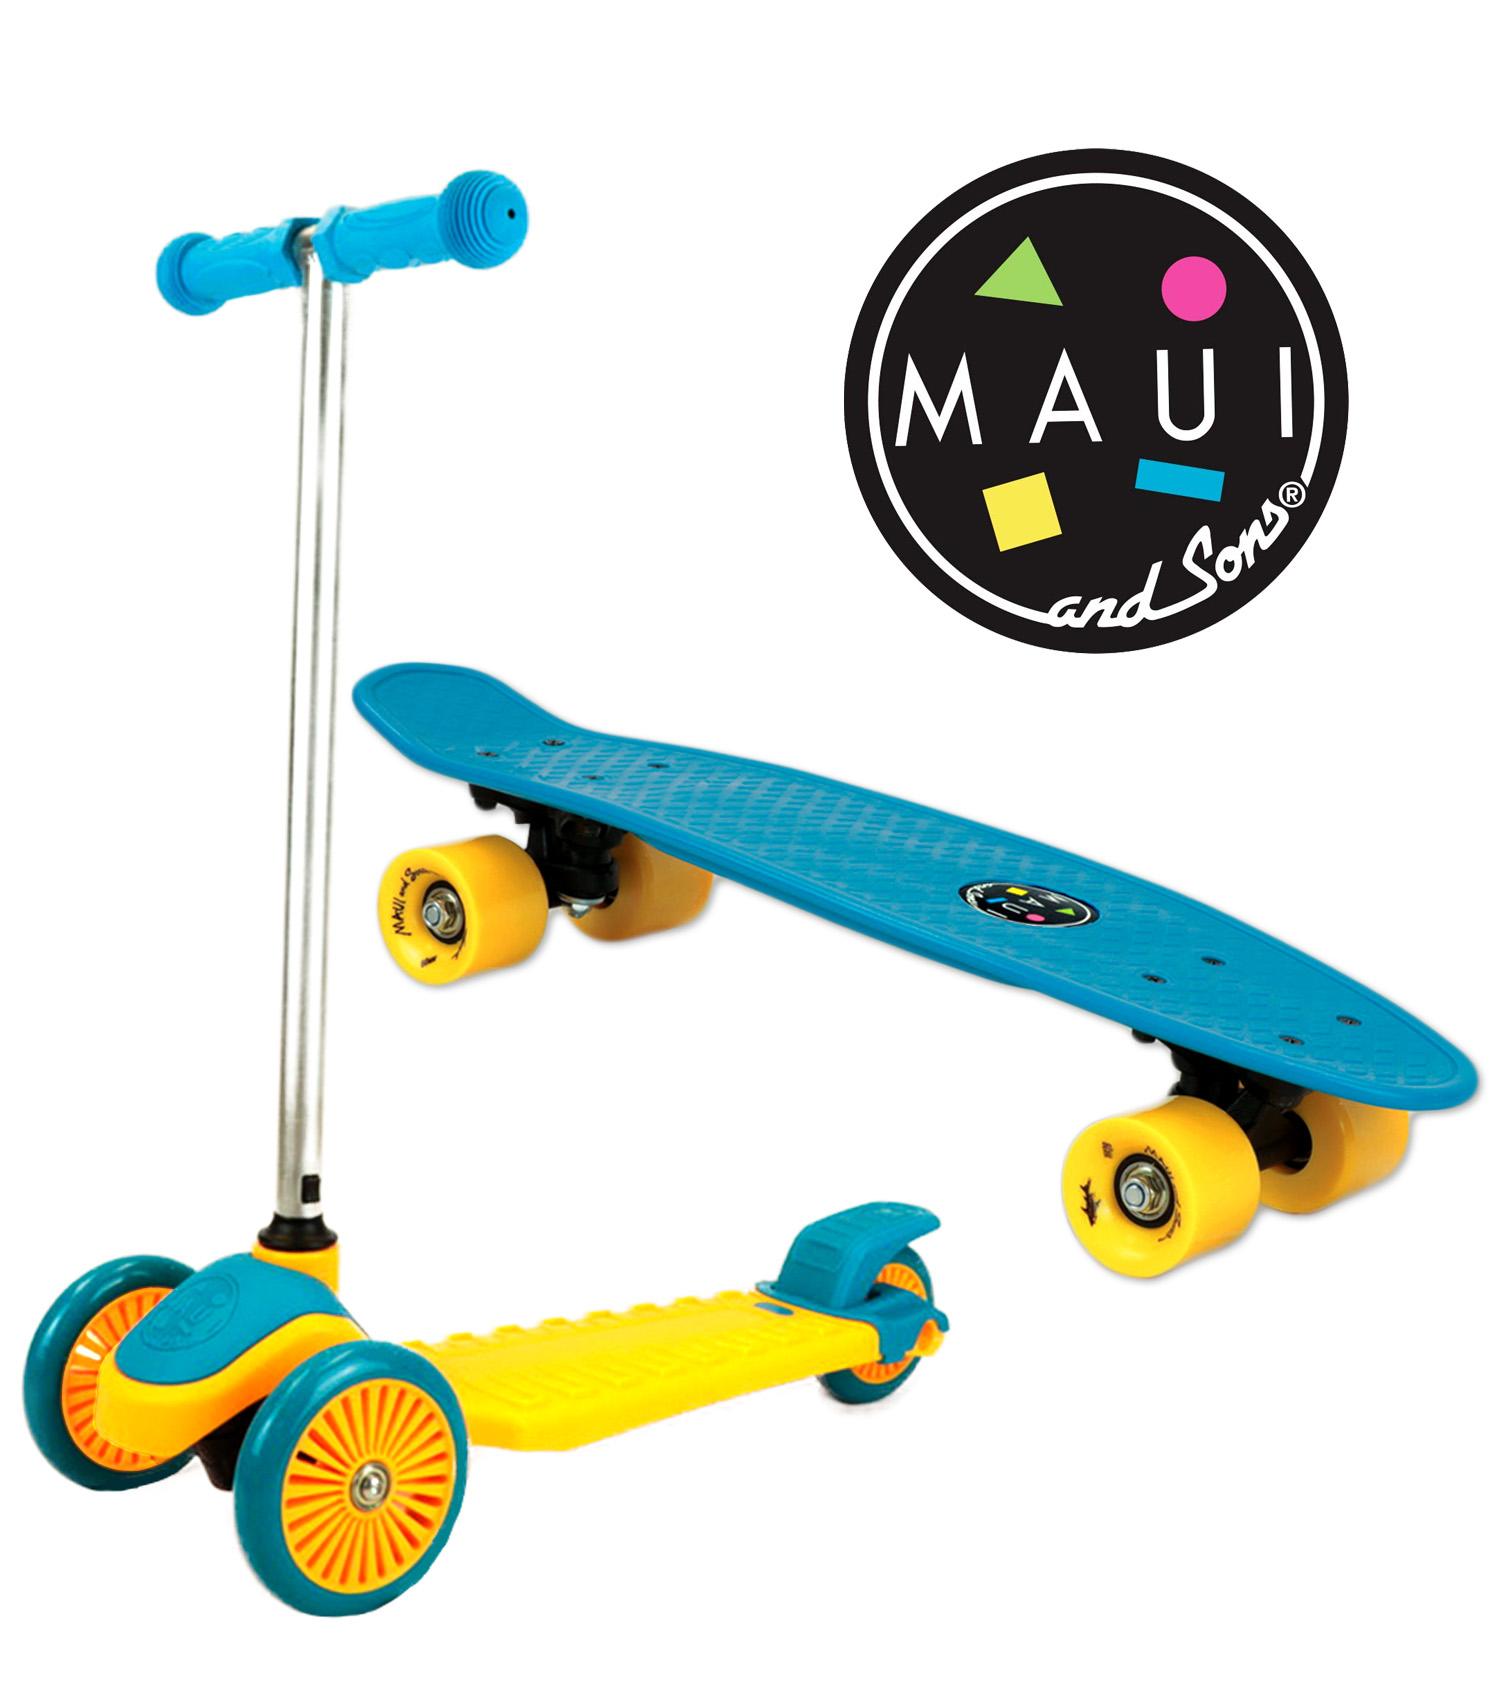 Maui and Sons Mini Sharkman Scooter and Skateboard Combo Set $26.95